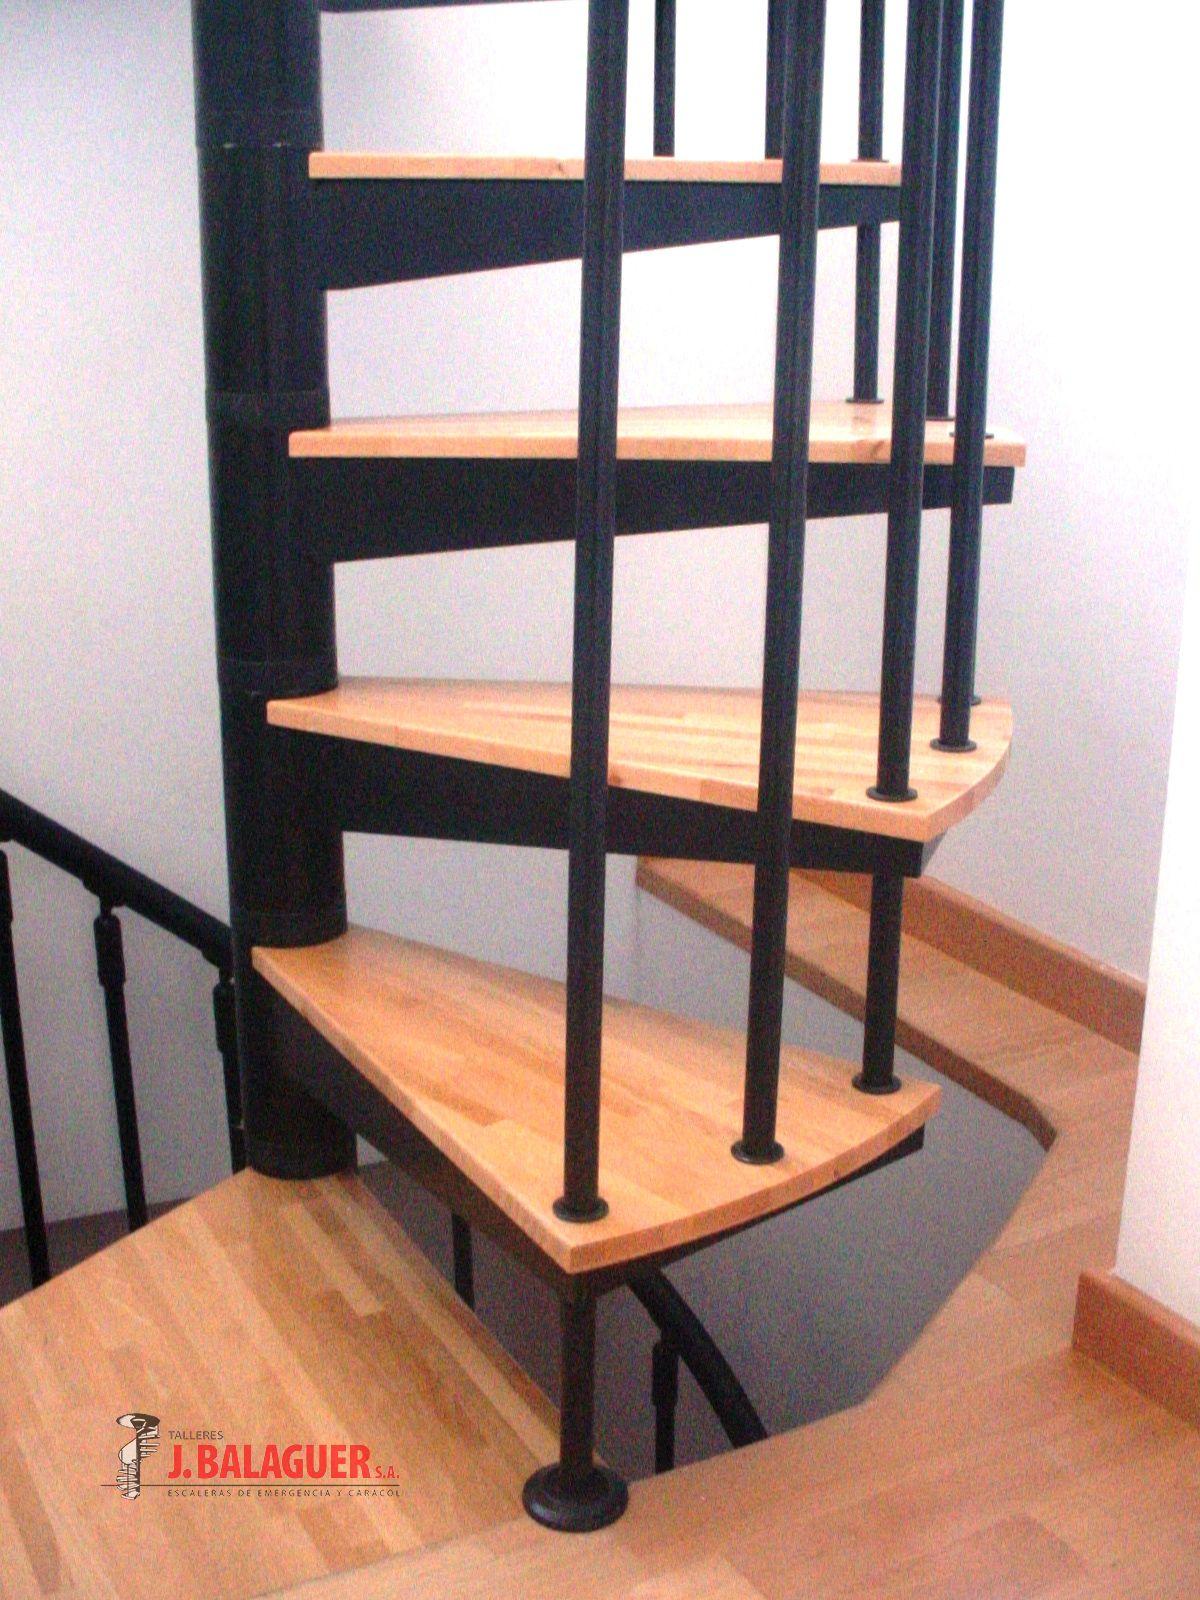 escaleras caracol con madera modelo m barandilla triple escaleras caracol con madera modelo m barandilla triple